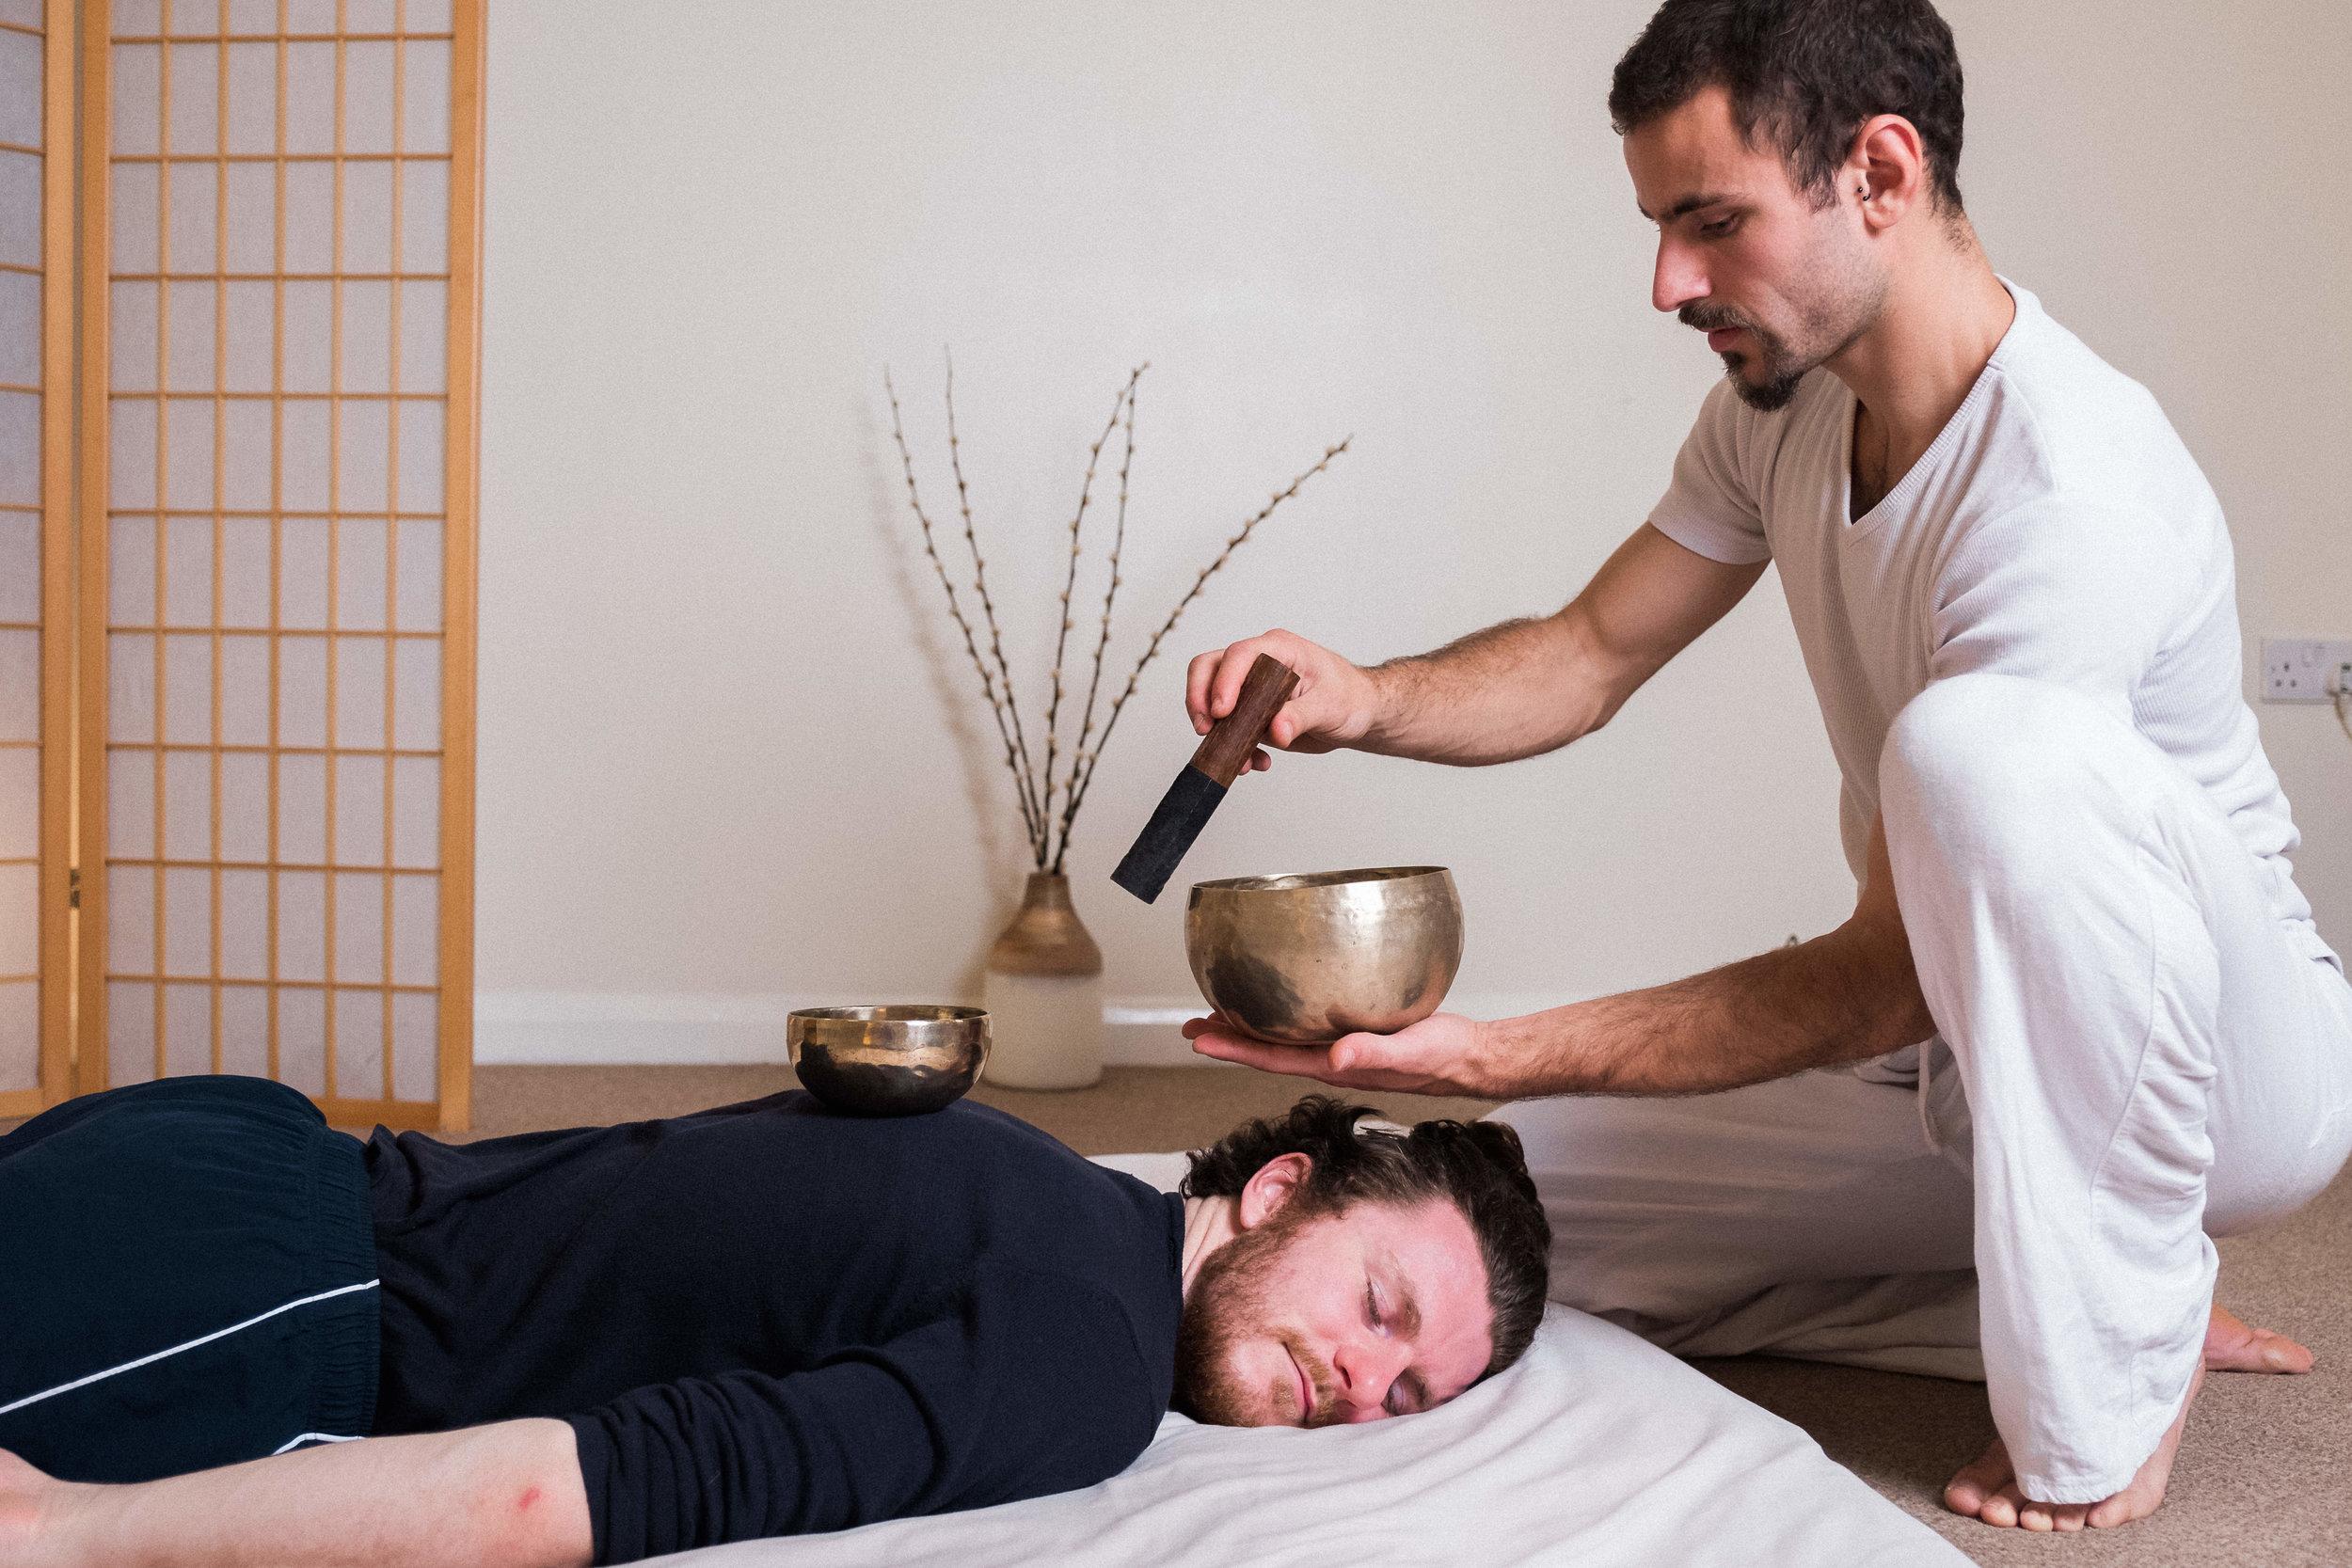 Massage-Edinburgh-Fern-Photography-0073-ZF-2290-64275-1-001-073.jpg